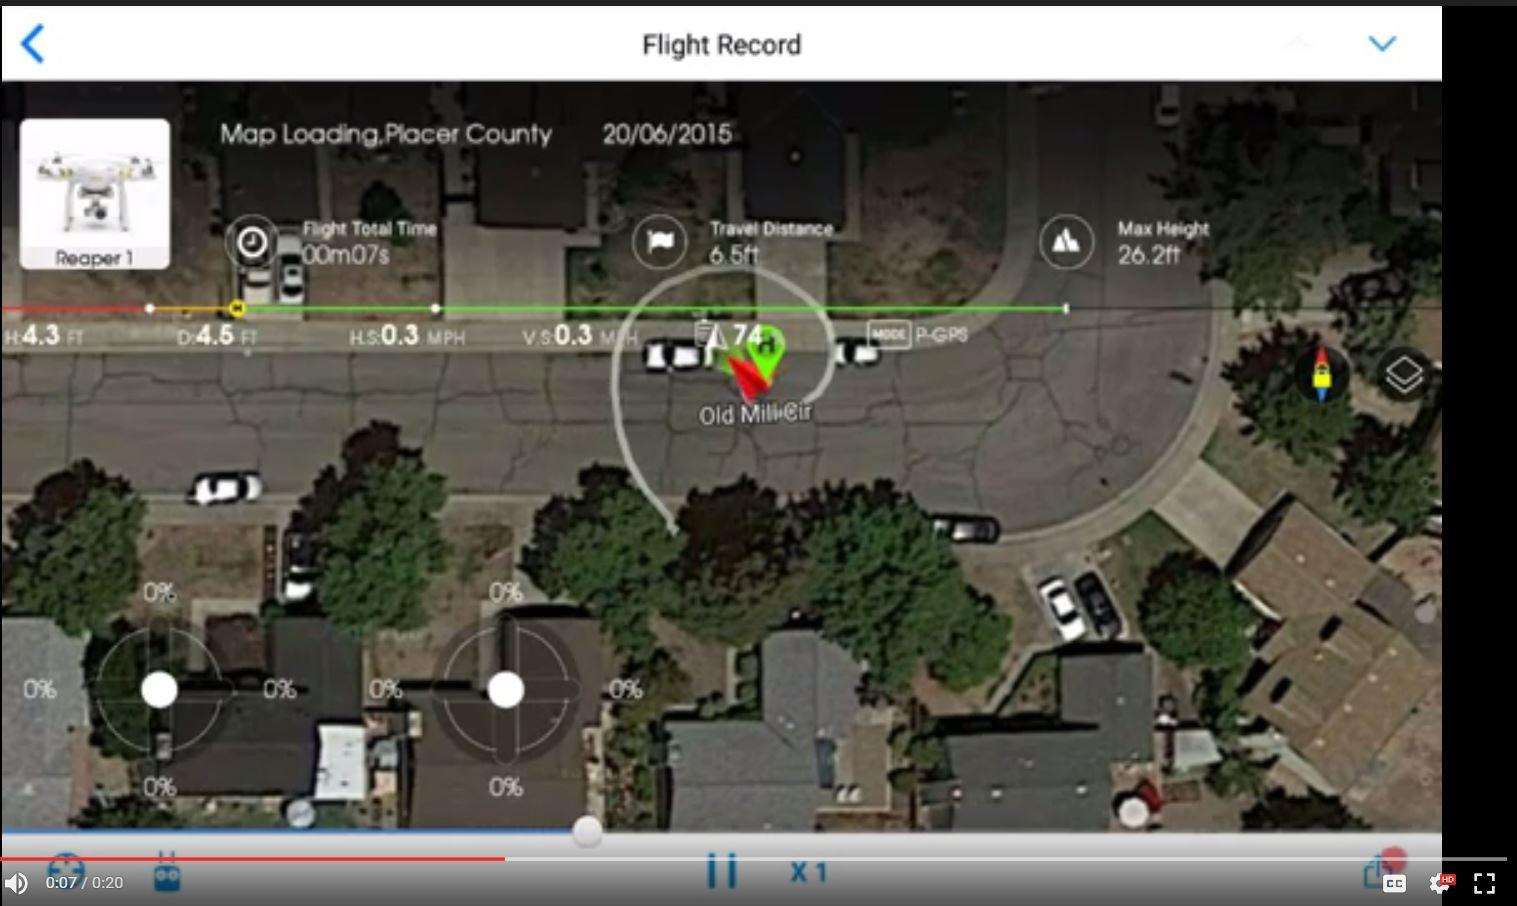 P3P Flight Record.JPG